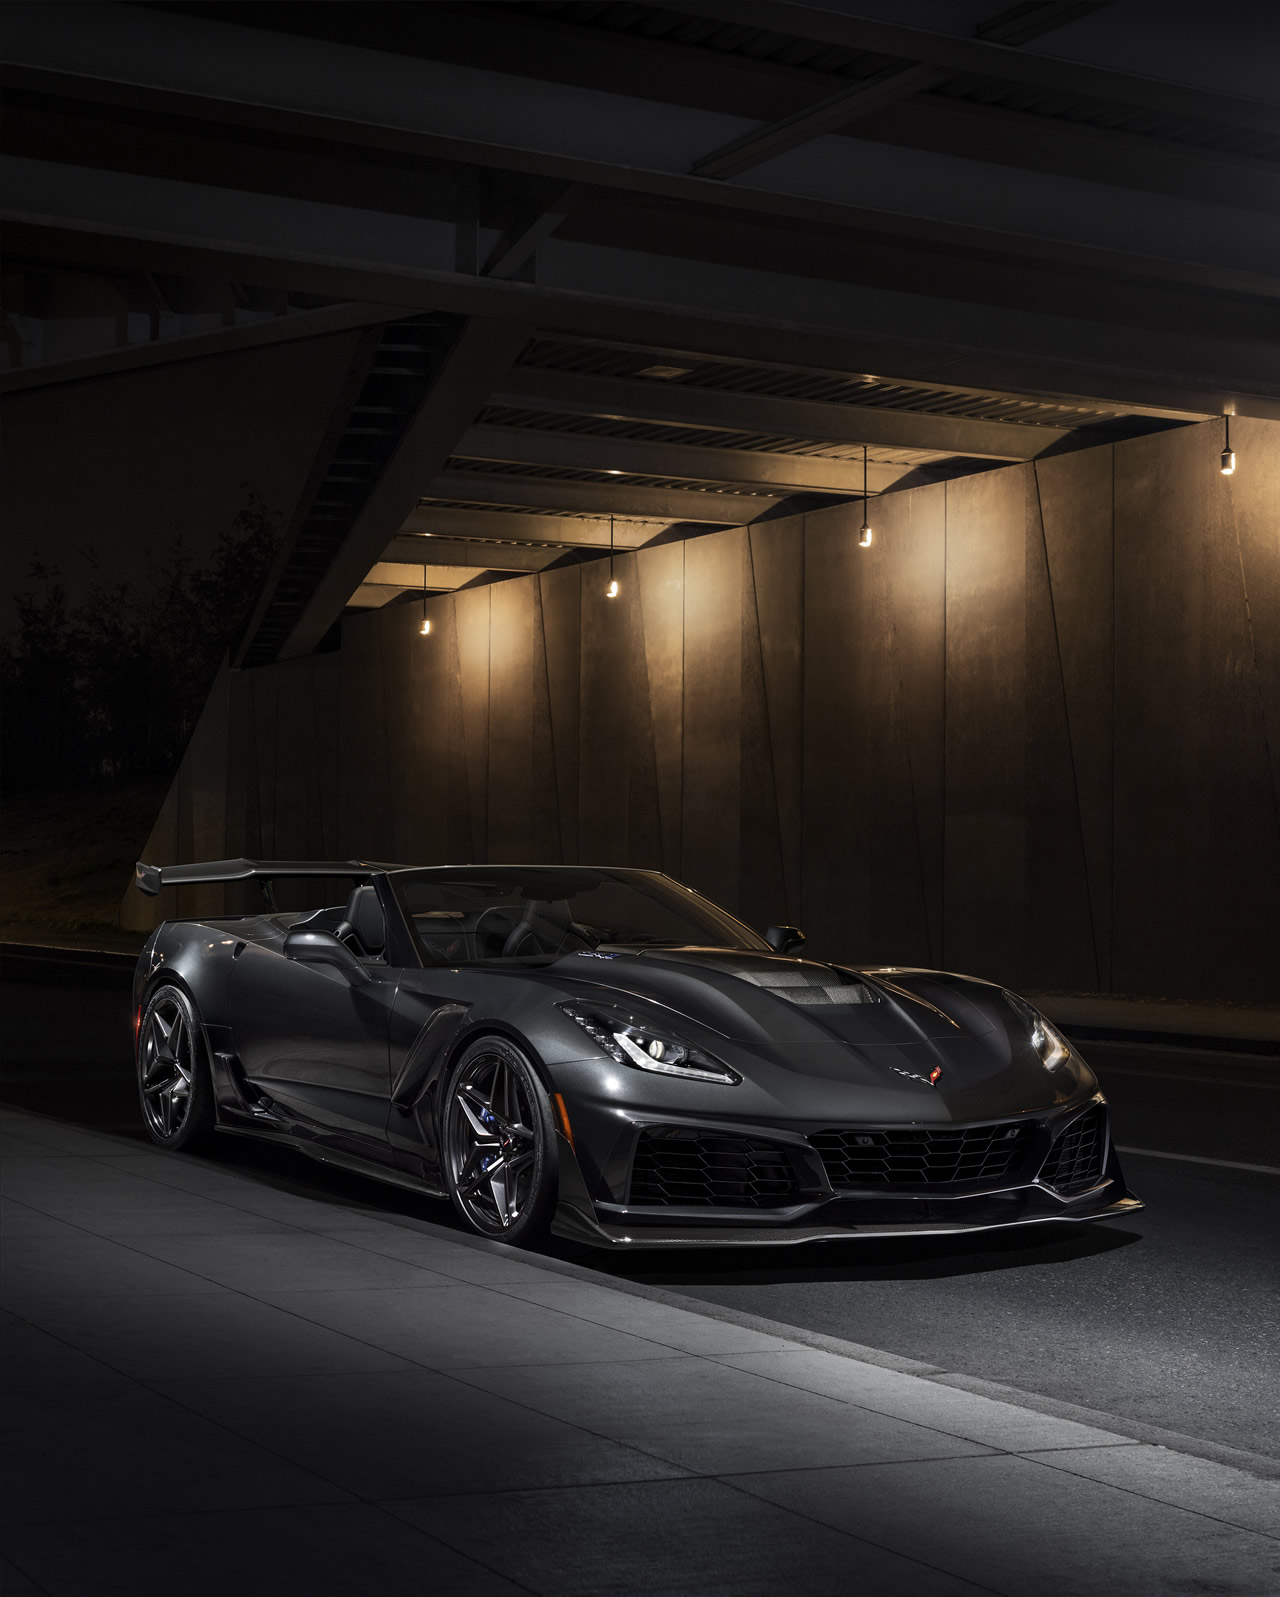 2019 Corvette ZR1 Coupe And Convertible Unveiled At LA